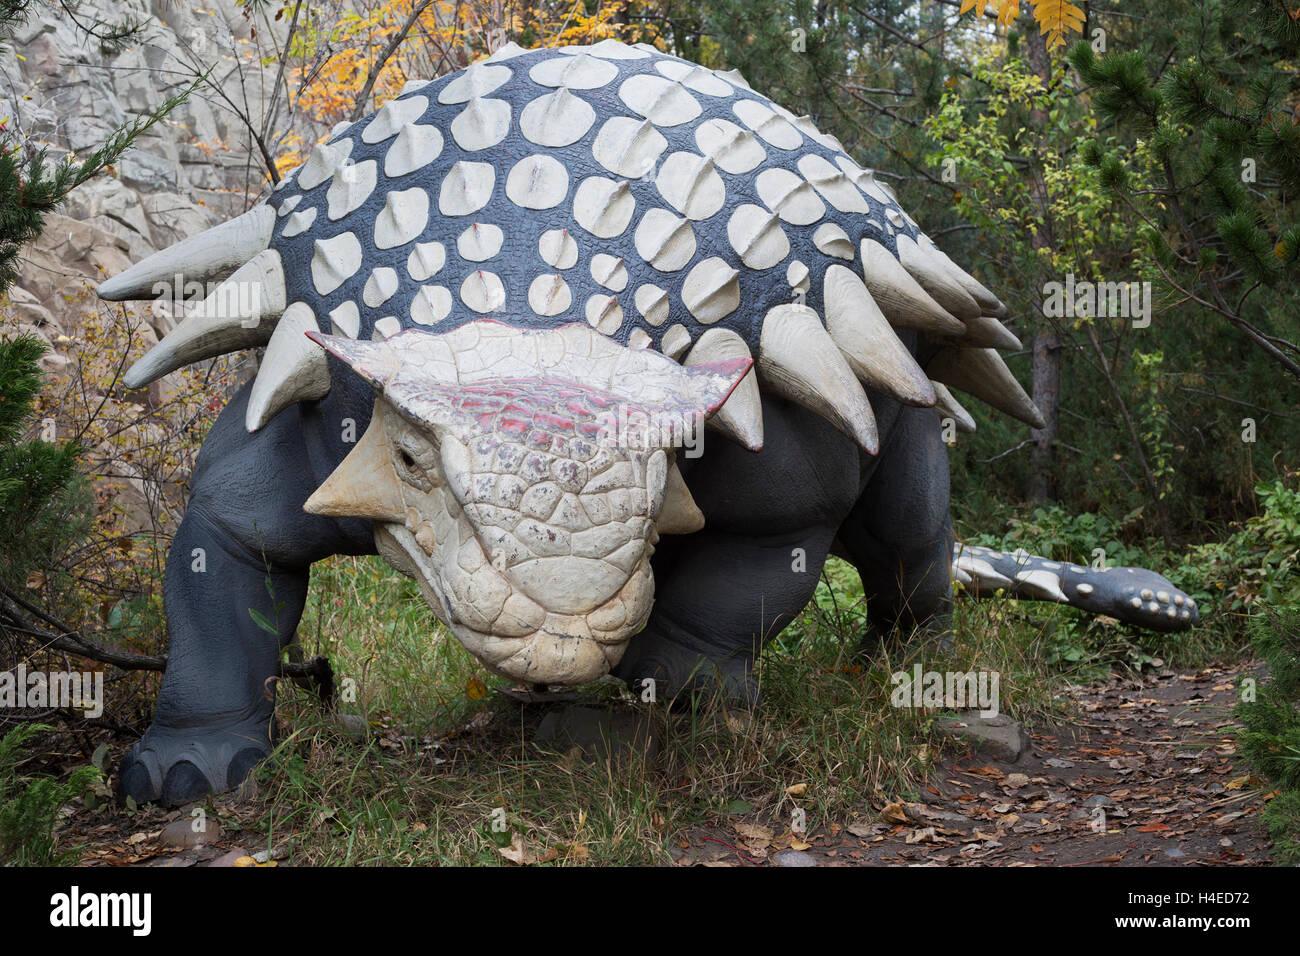 Anklyosaurus dinosaur model at the Calgary Zoo prehistoric park - Stock Image